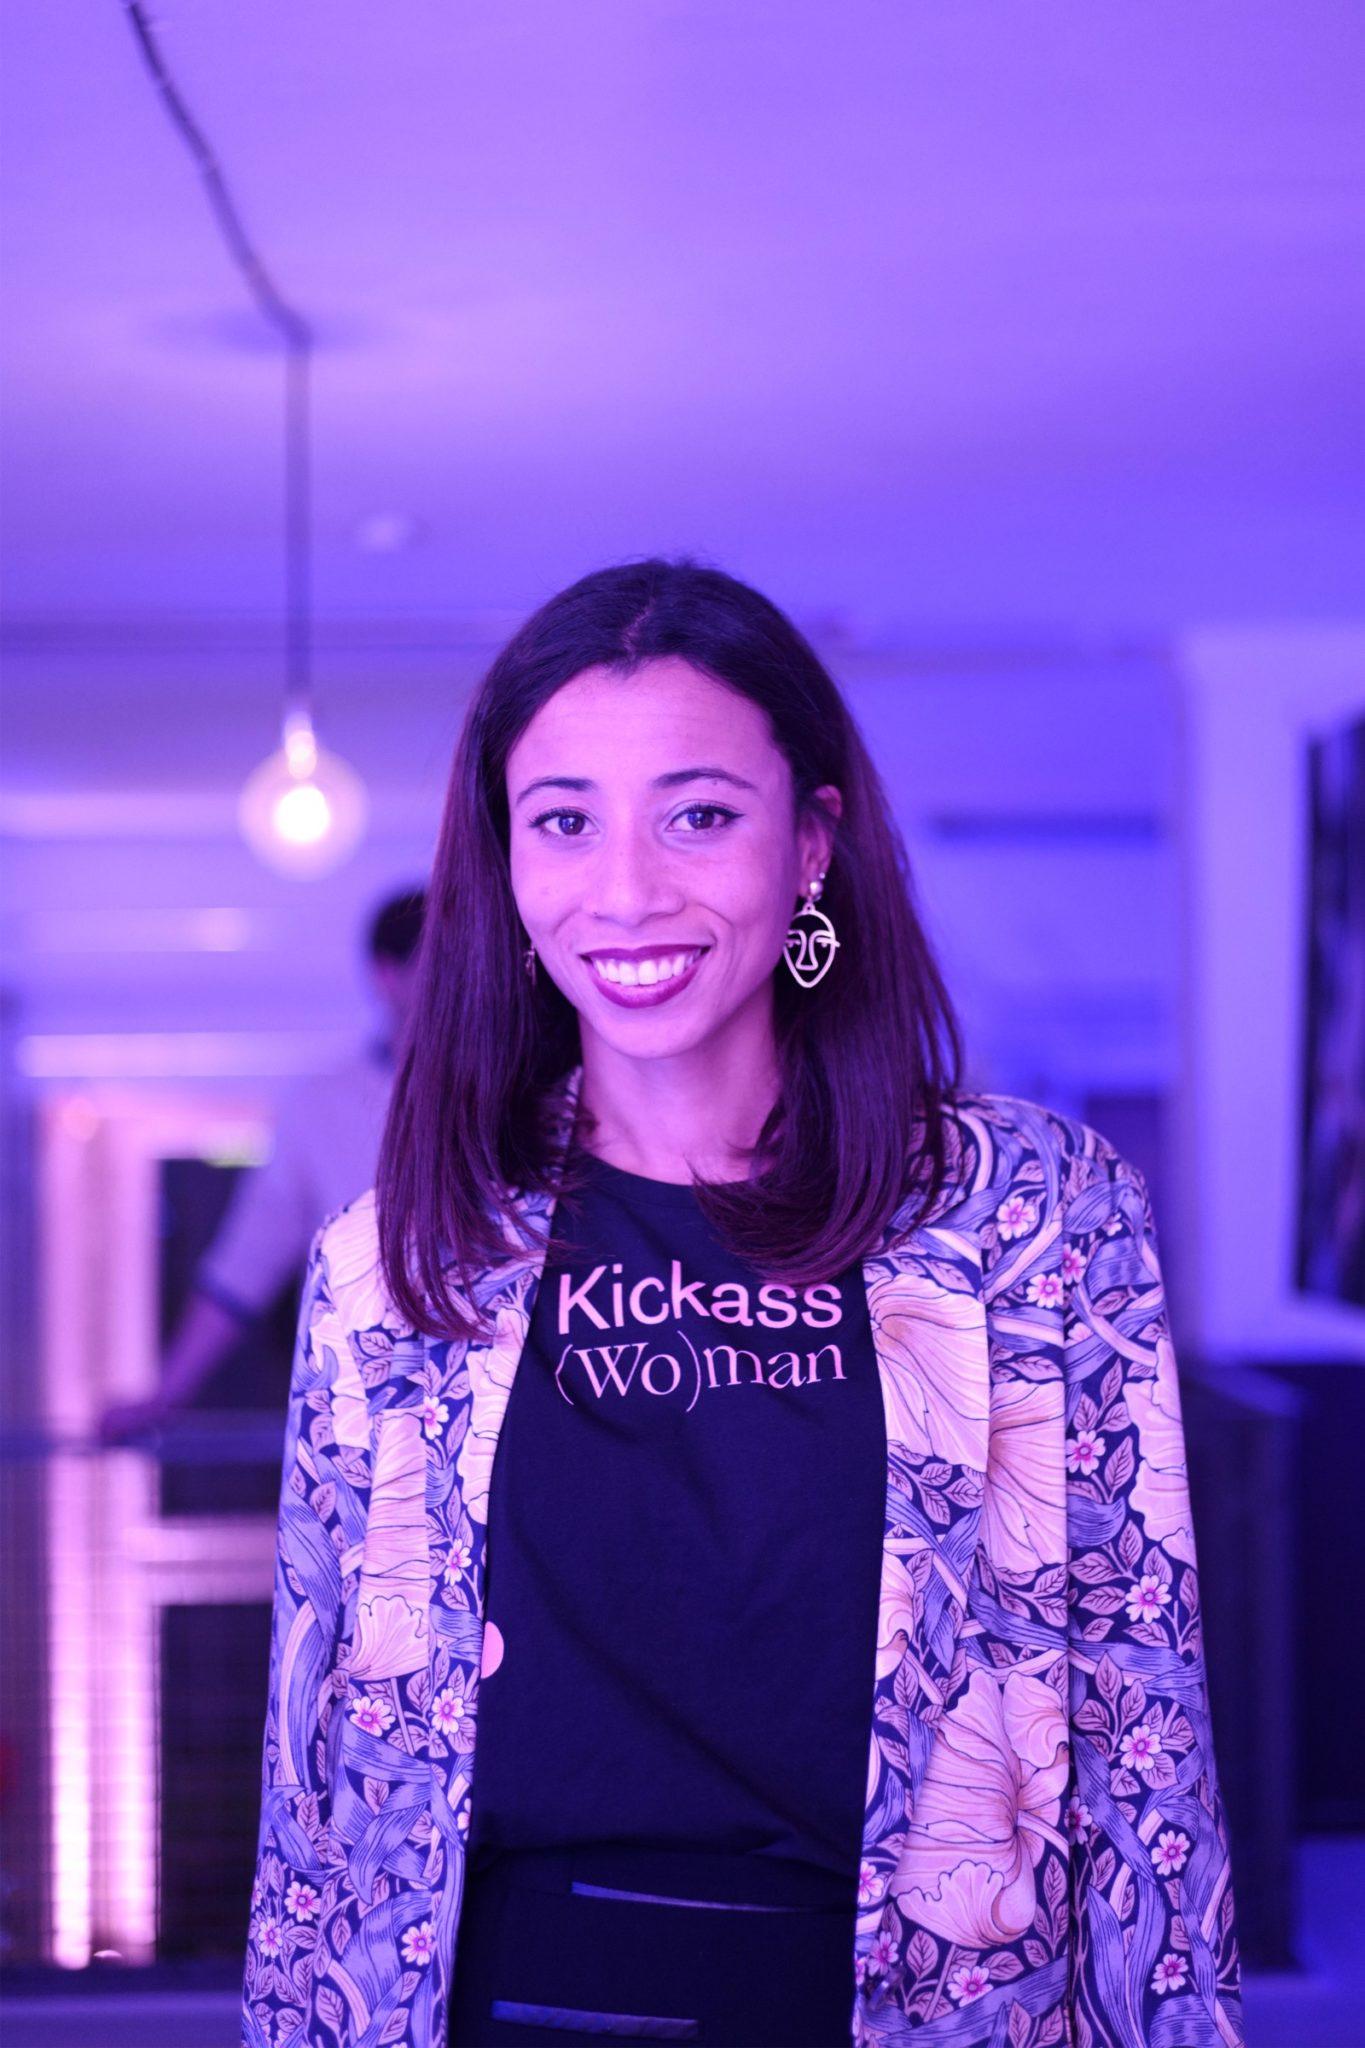 CelebratingKickassWomen Networking 25.10.18 20